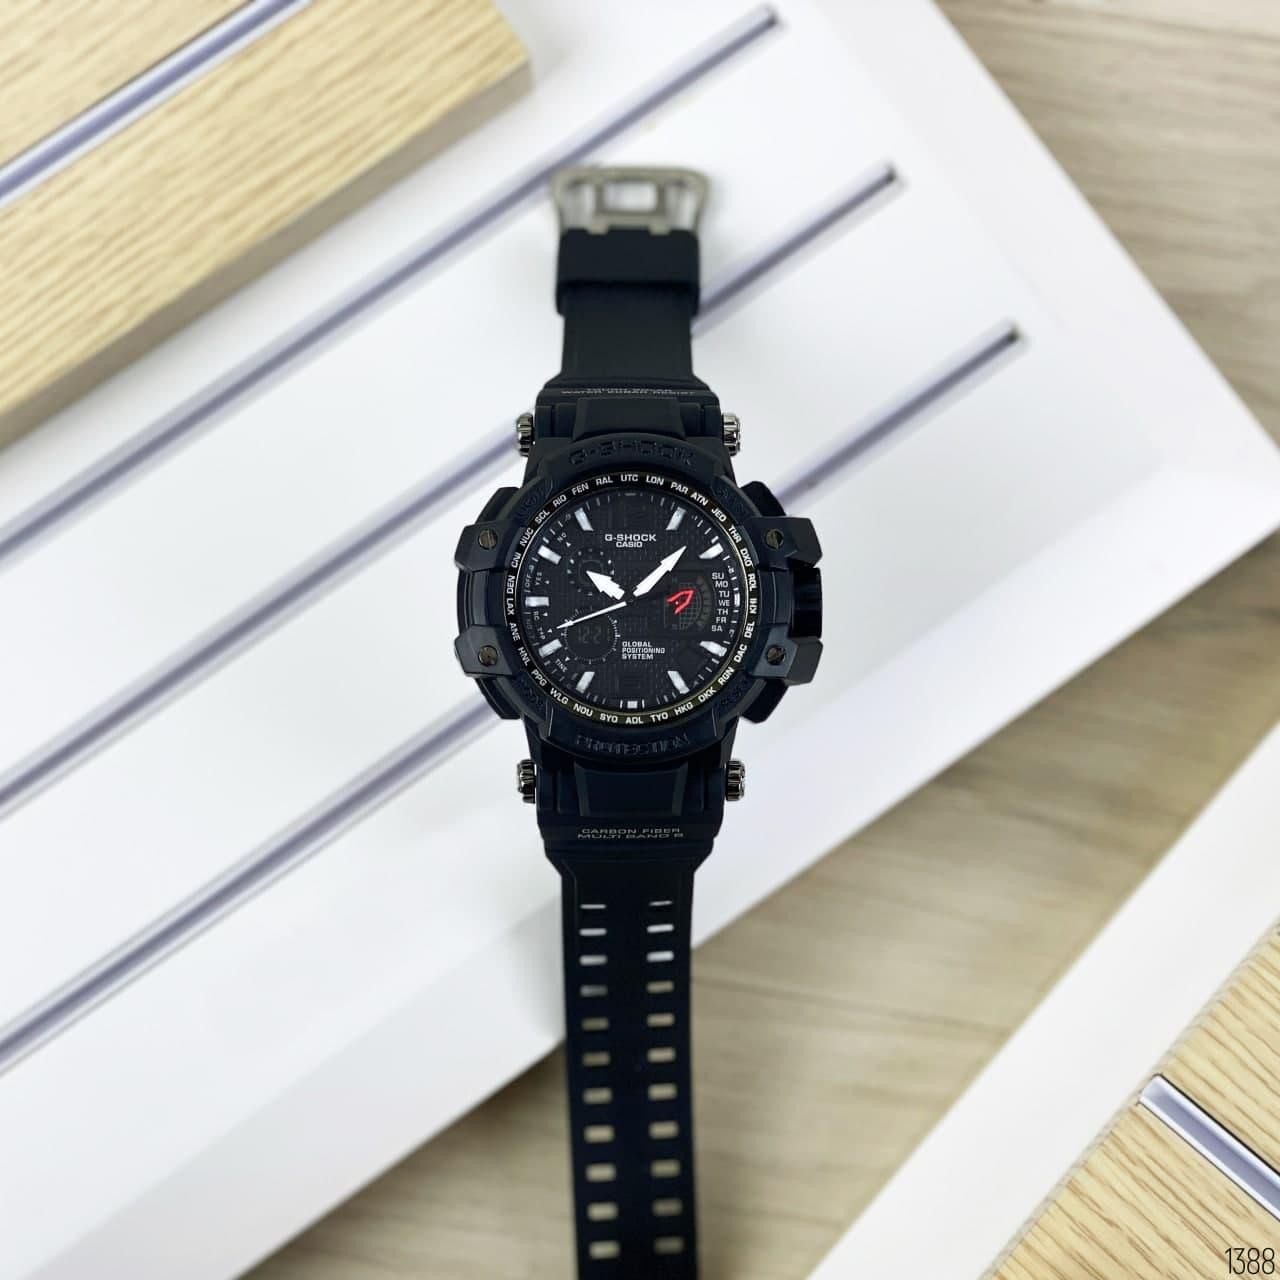 Casio G-Shock GPW-1000 (All Black)